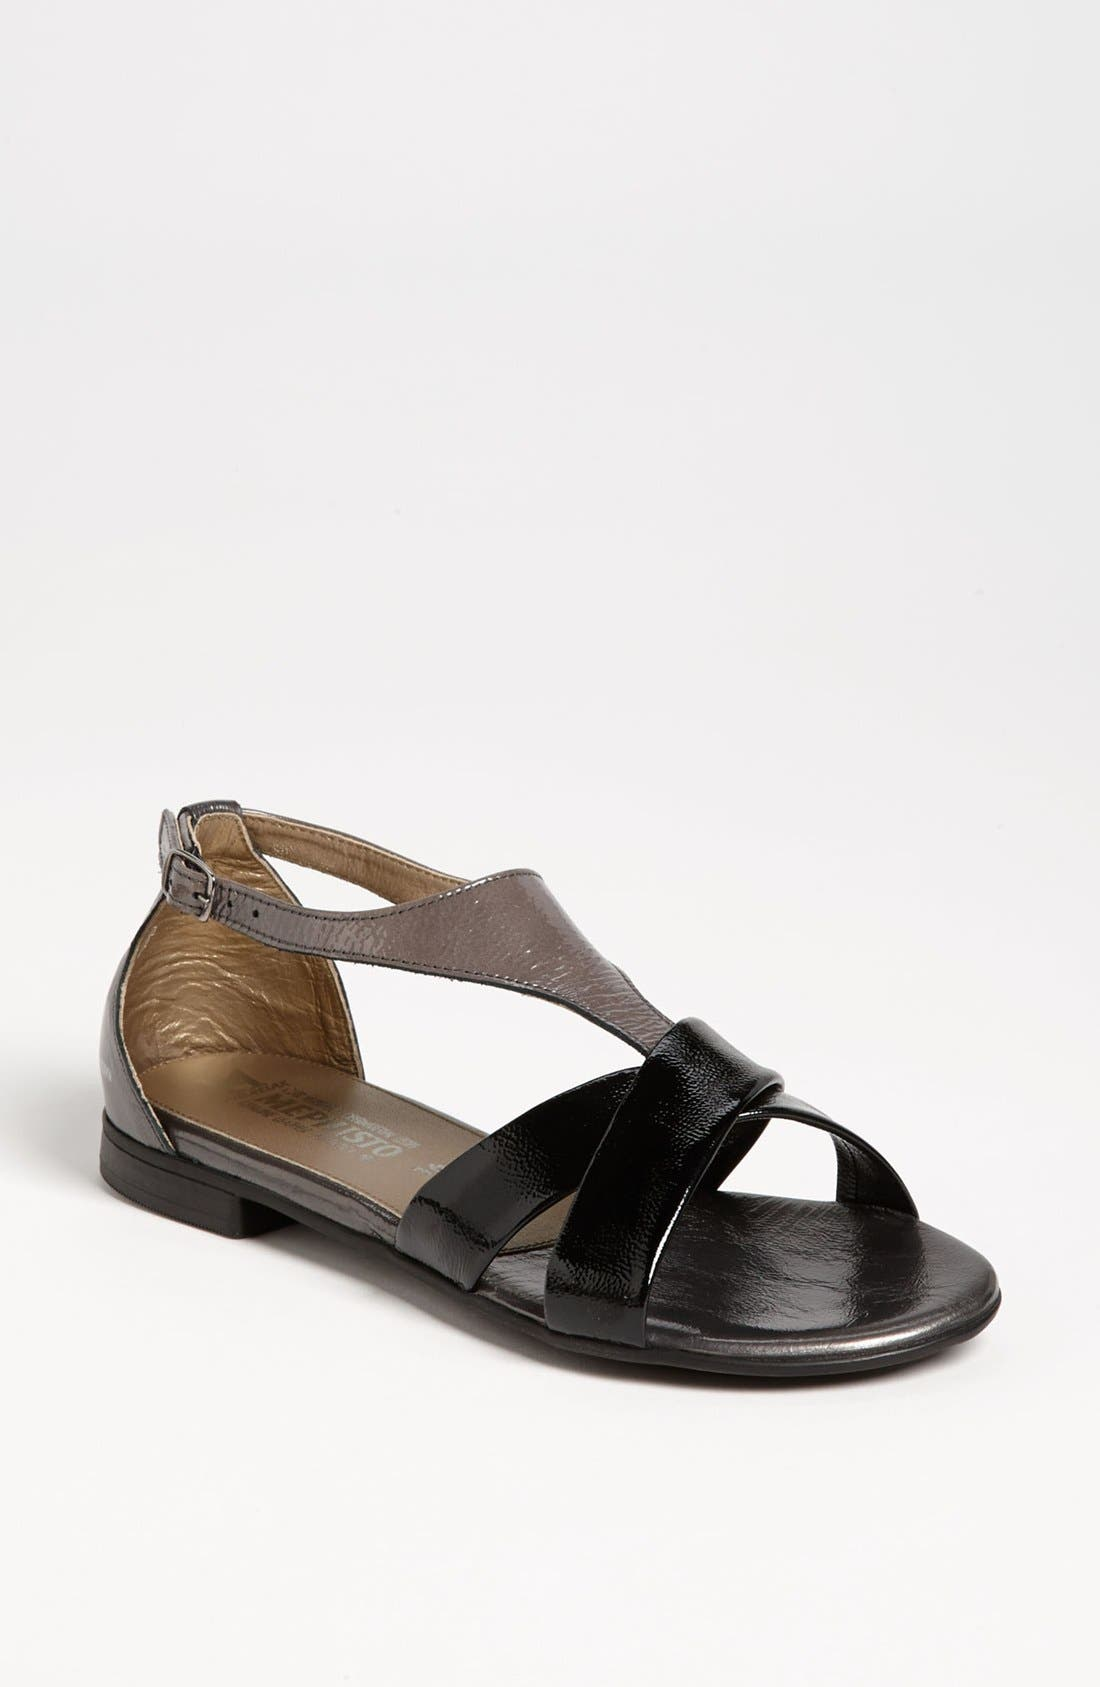 Main Image - Mephisto 'Zazia' Sandal